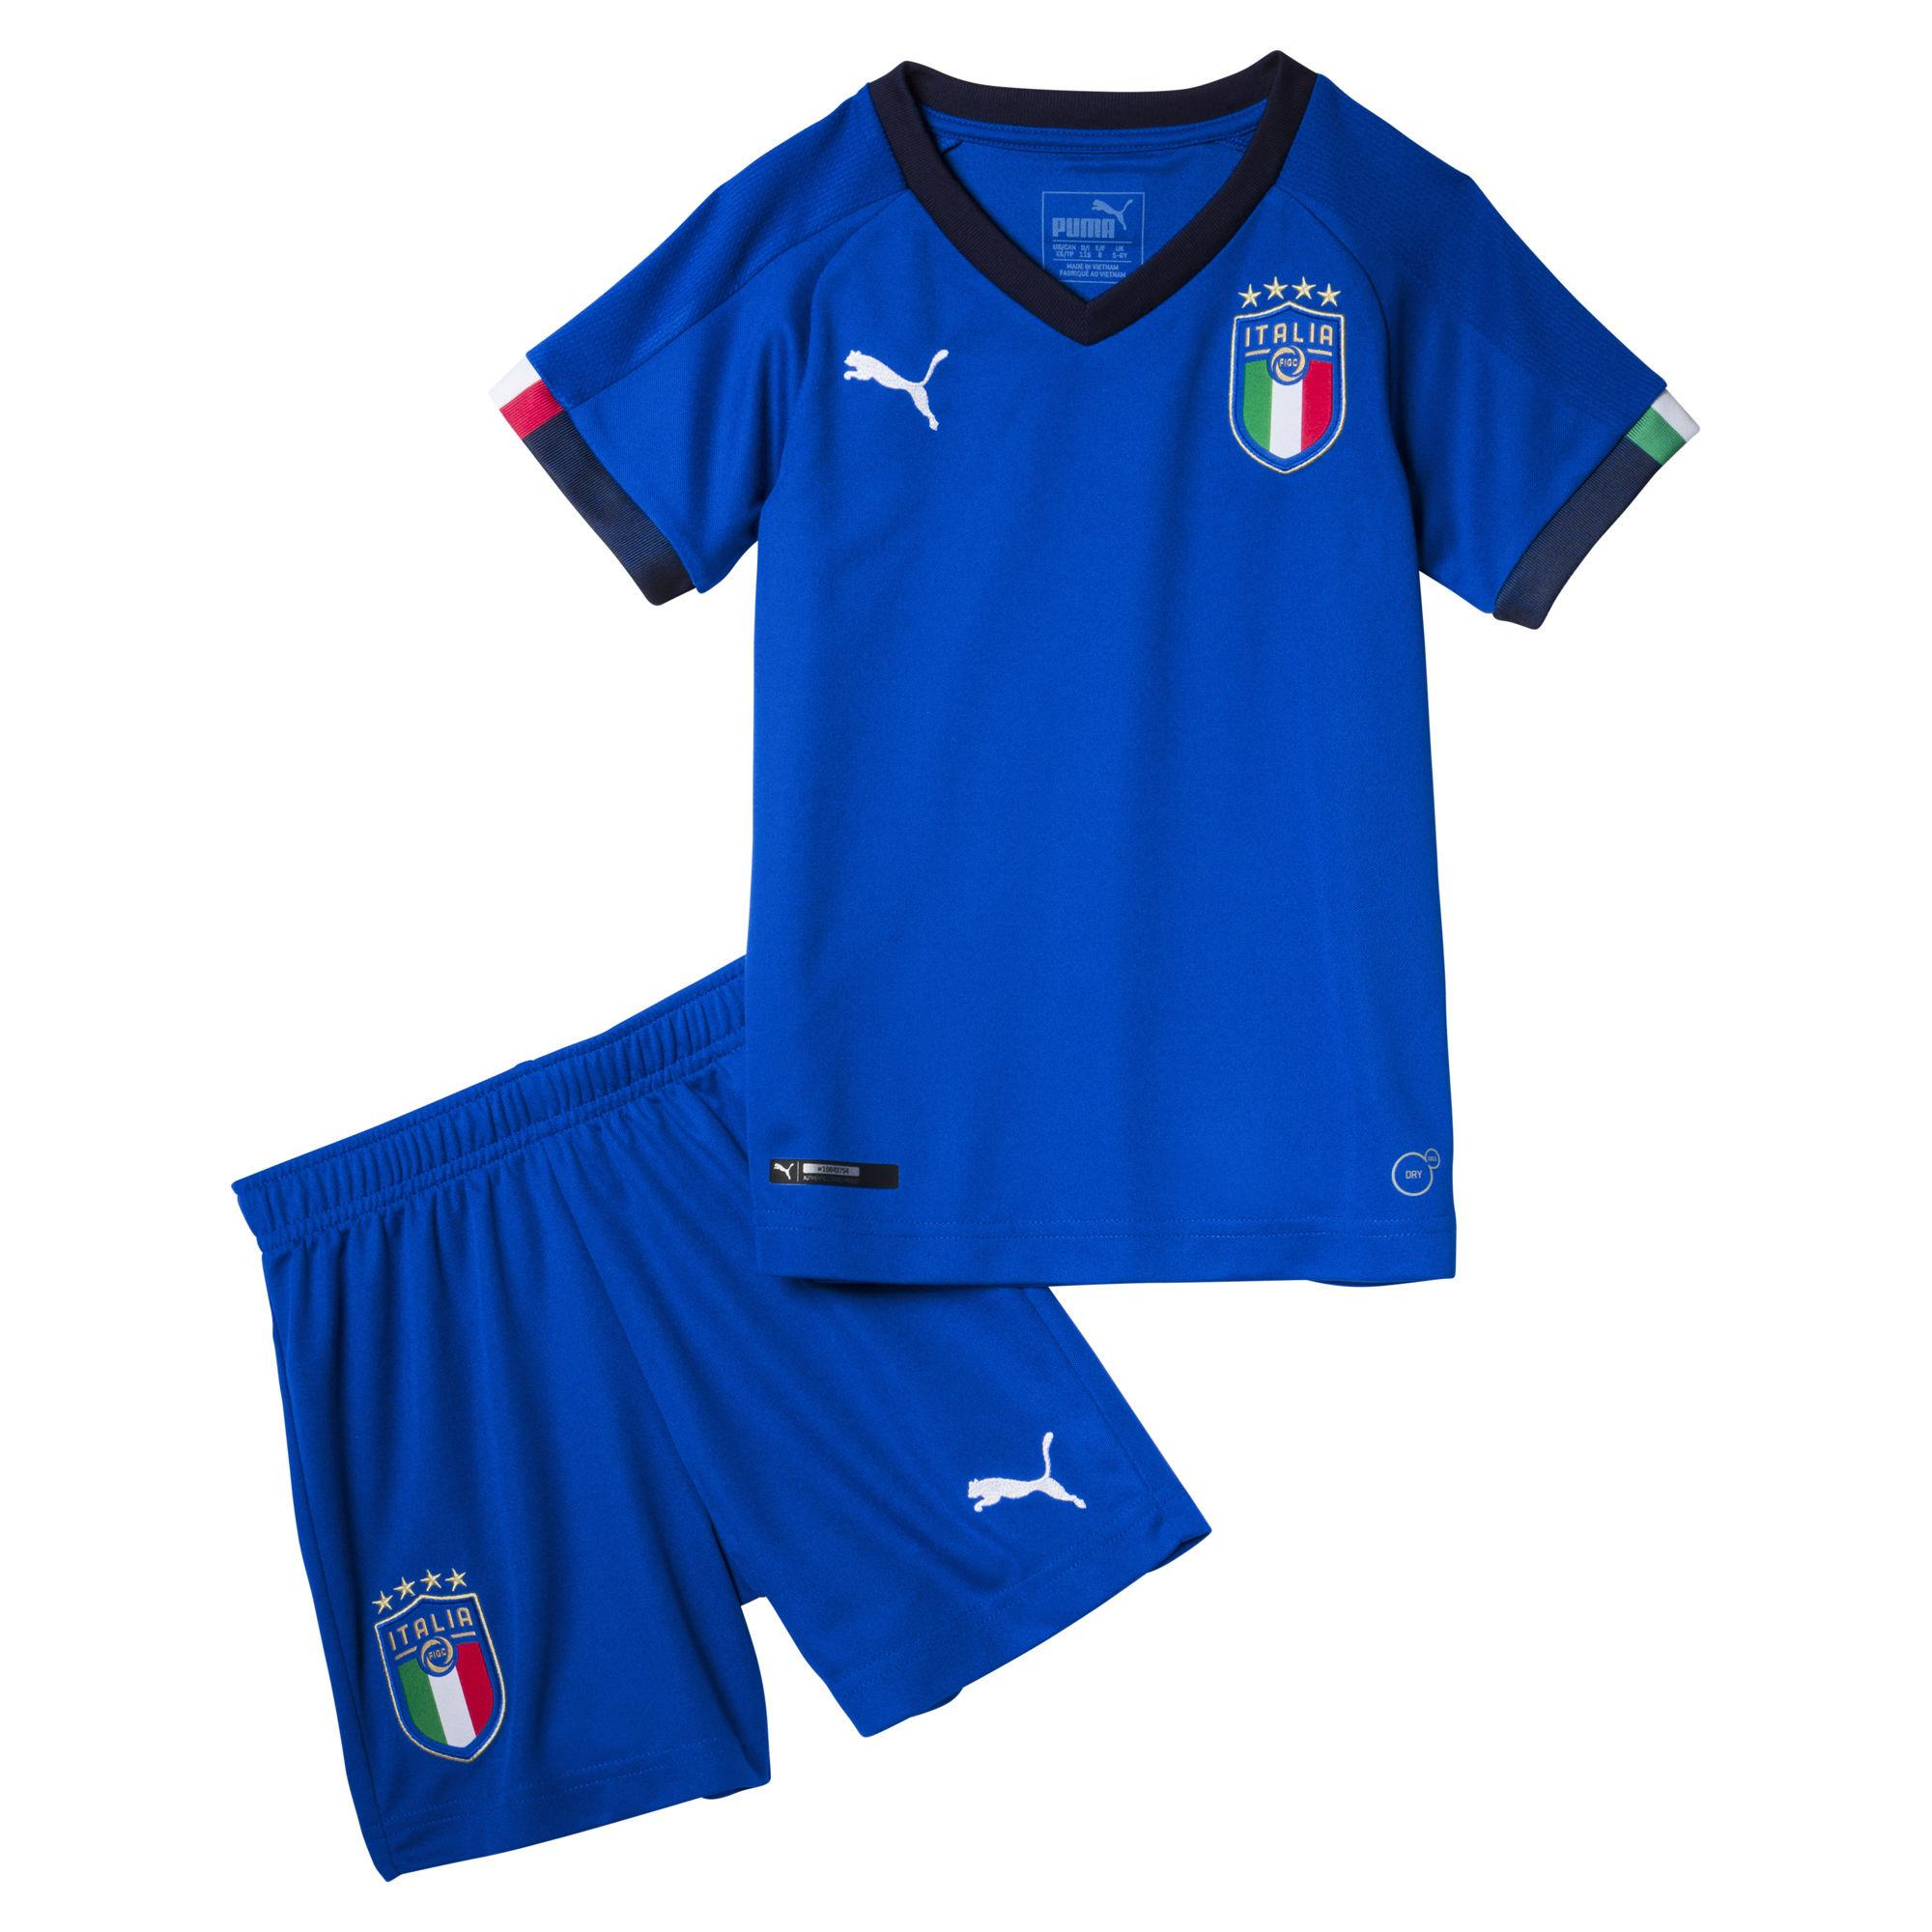 Minikit Figc Italia